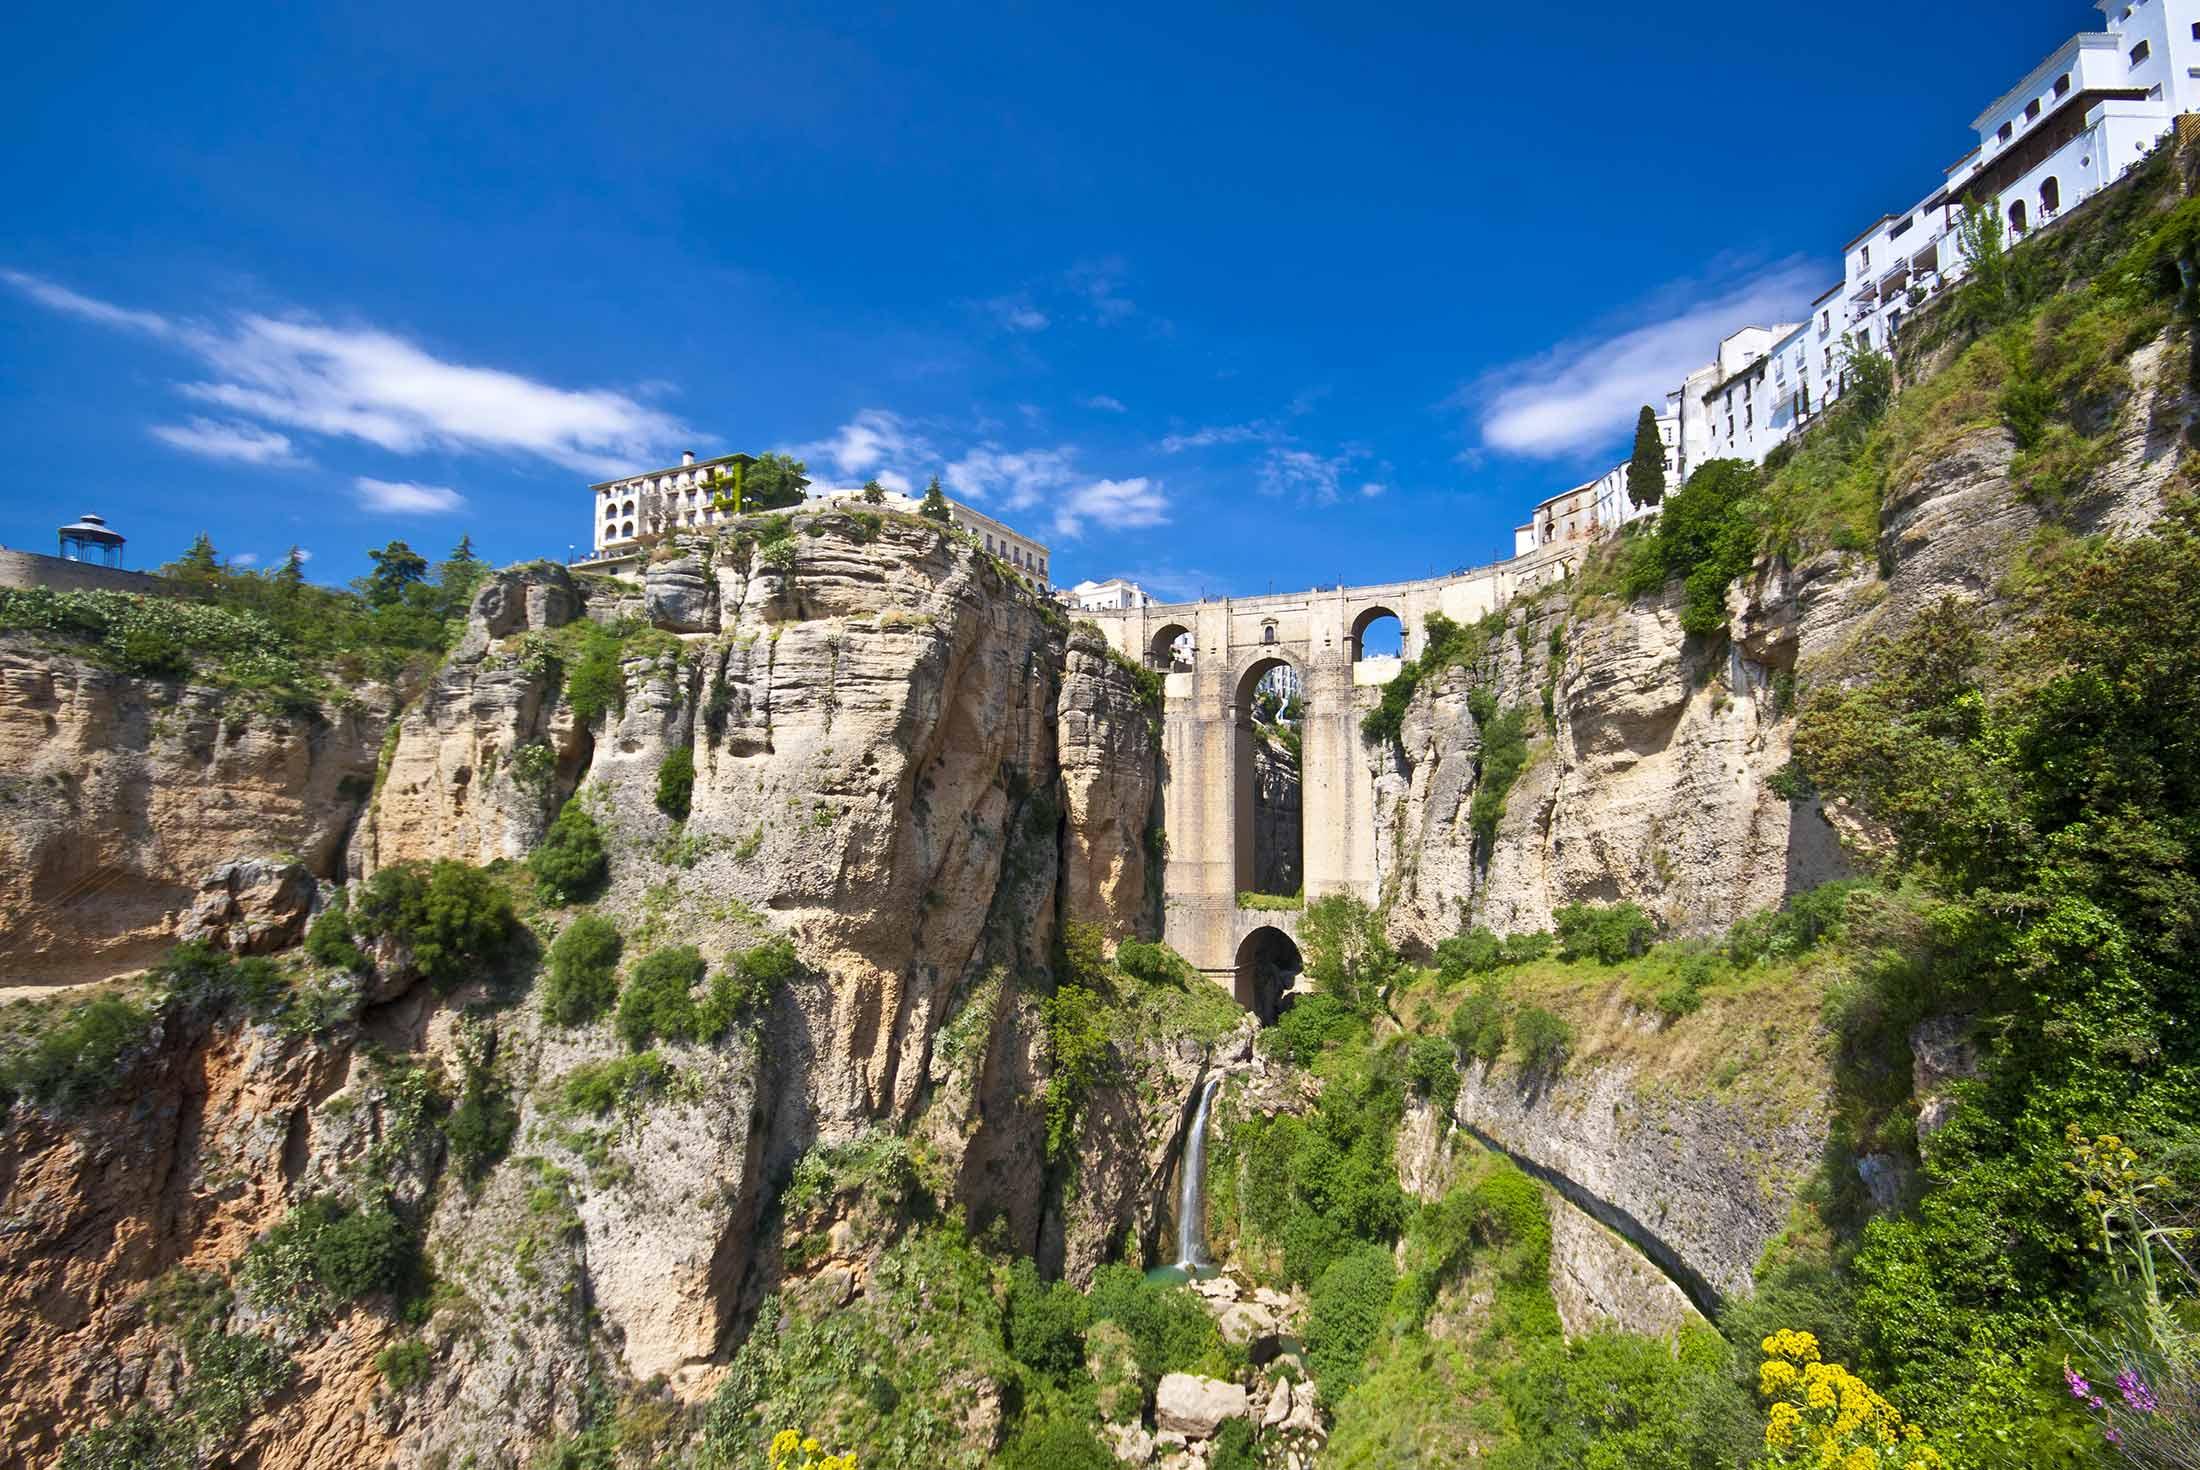 Cruising Spain and Portugal - Lisbon to Malaga 2